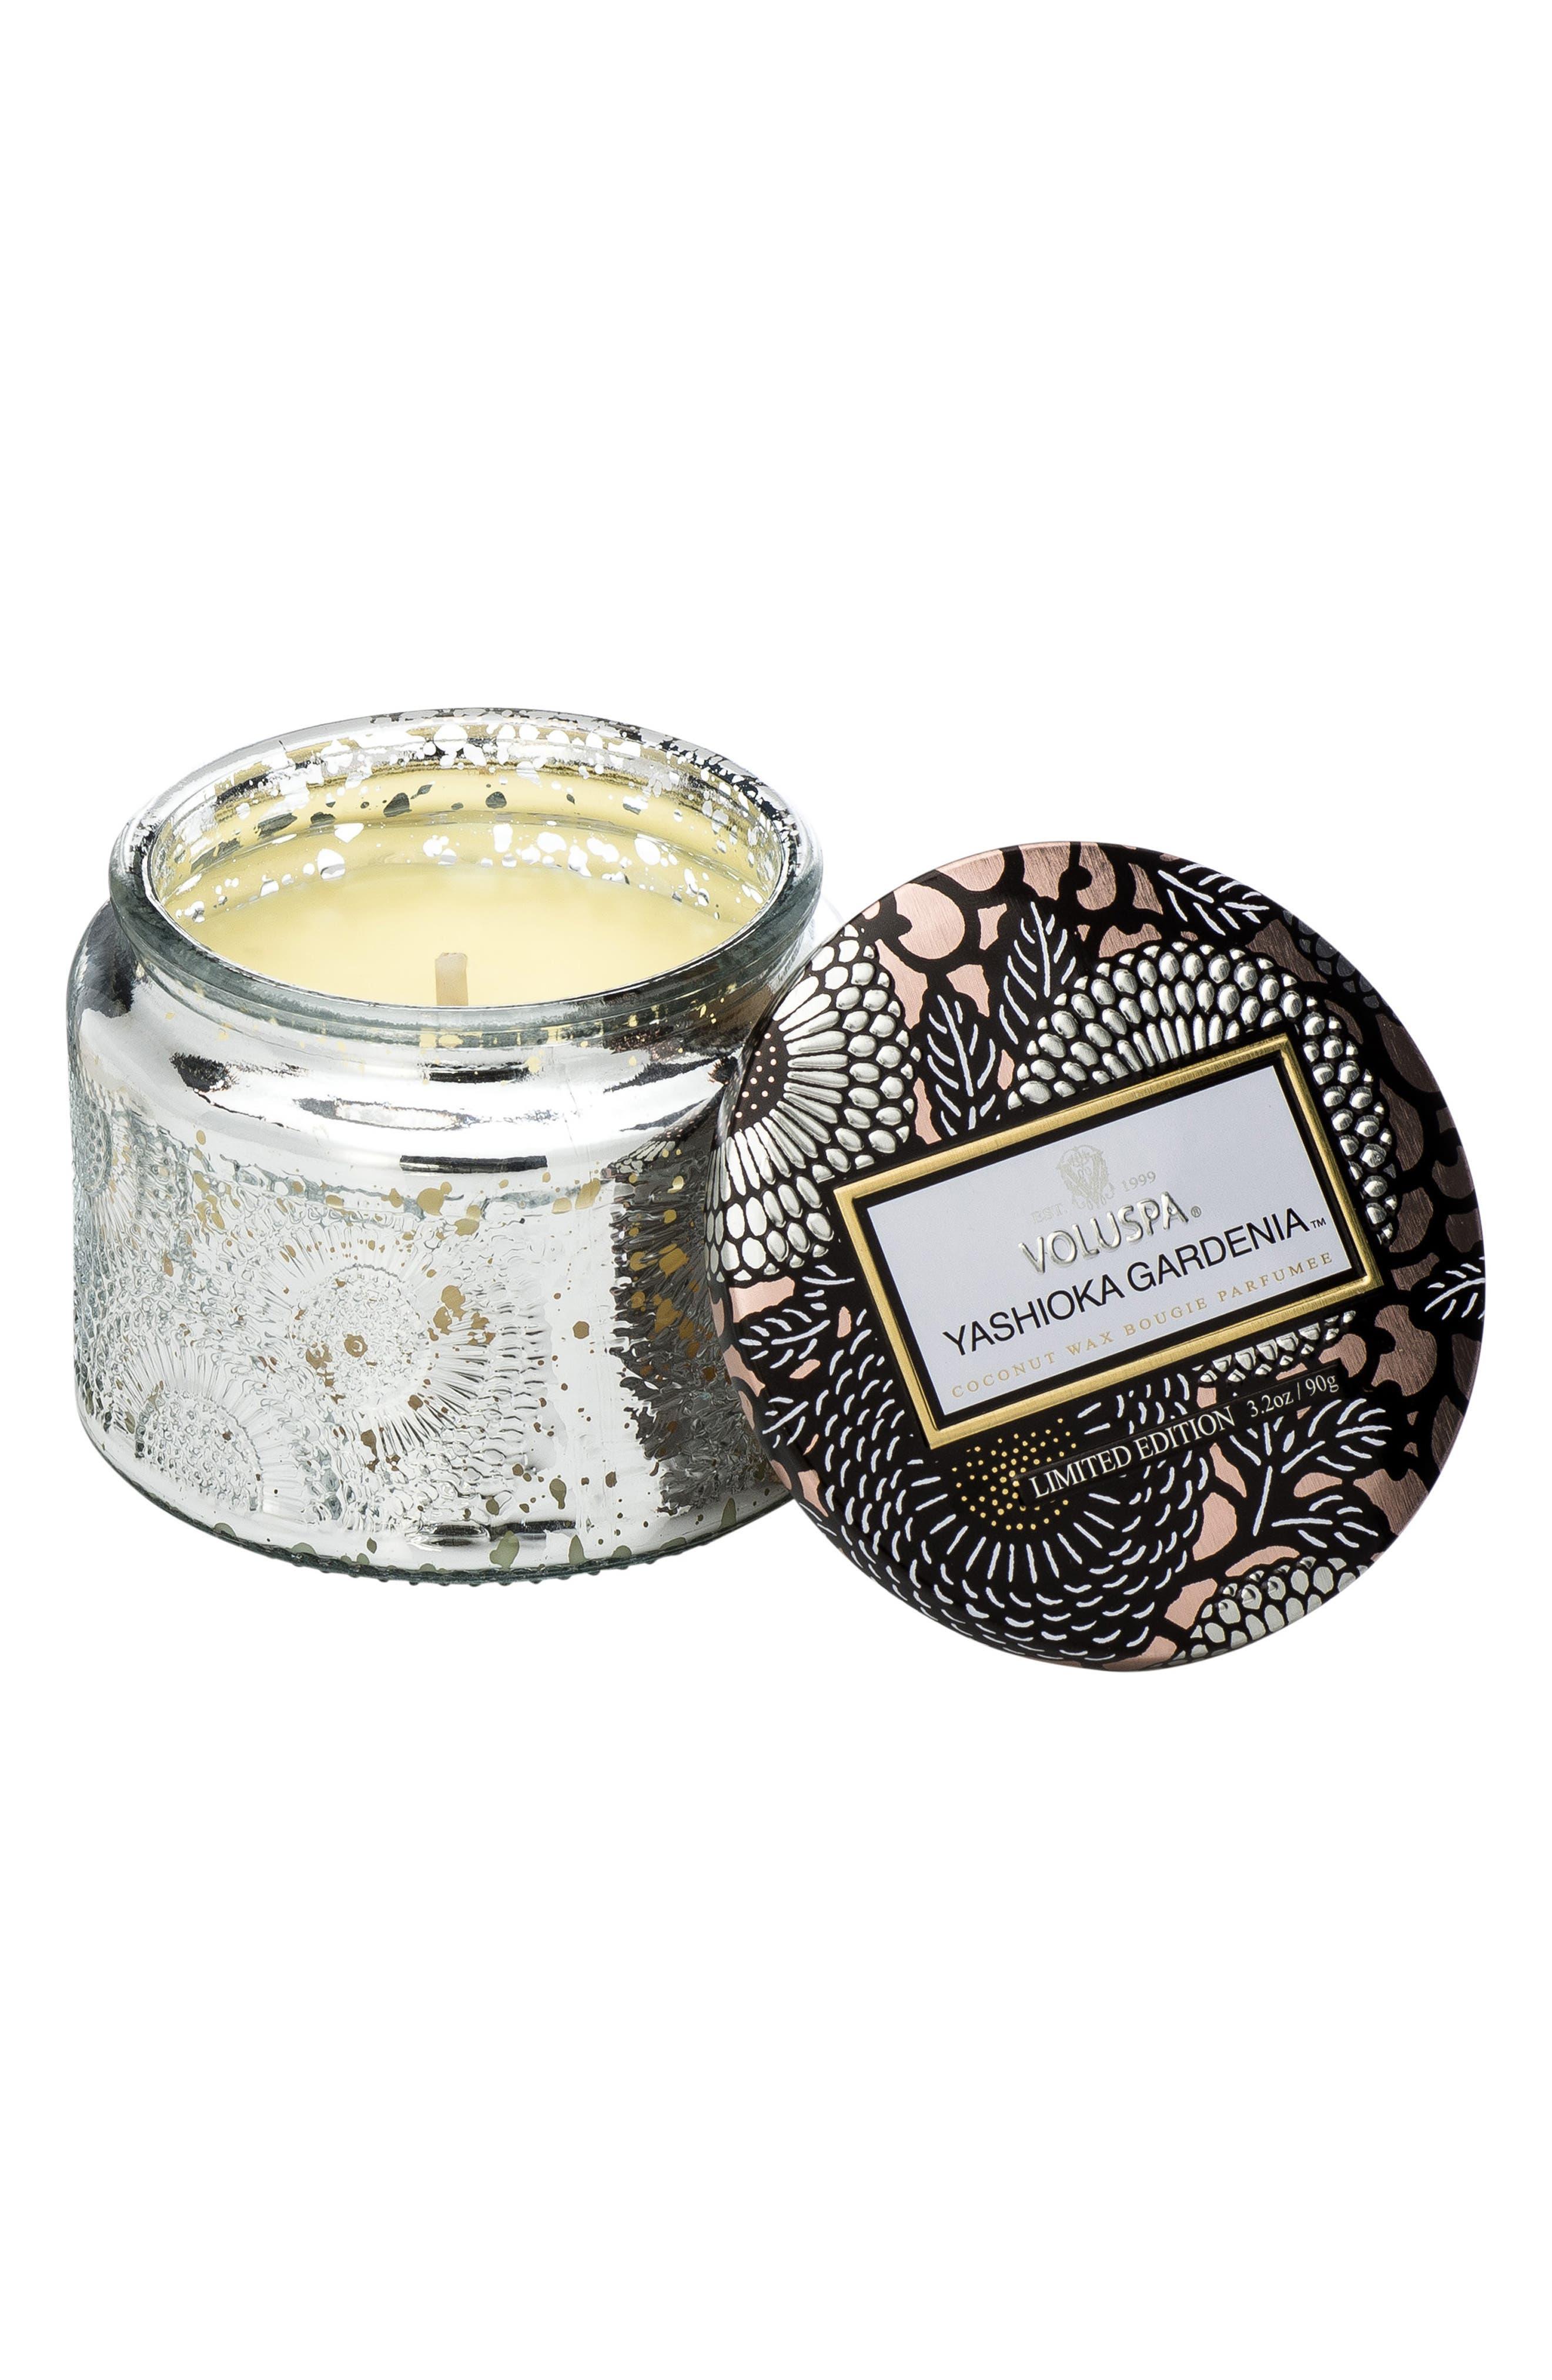 VOLUSPA,                             Japonica Yashioka Gardenia Petite Embossed Glass Jar Candle,                             Main thumbnail 1, color,                             YASHIOKA GARDENIA